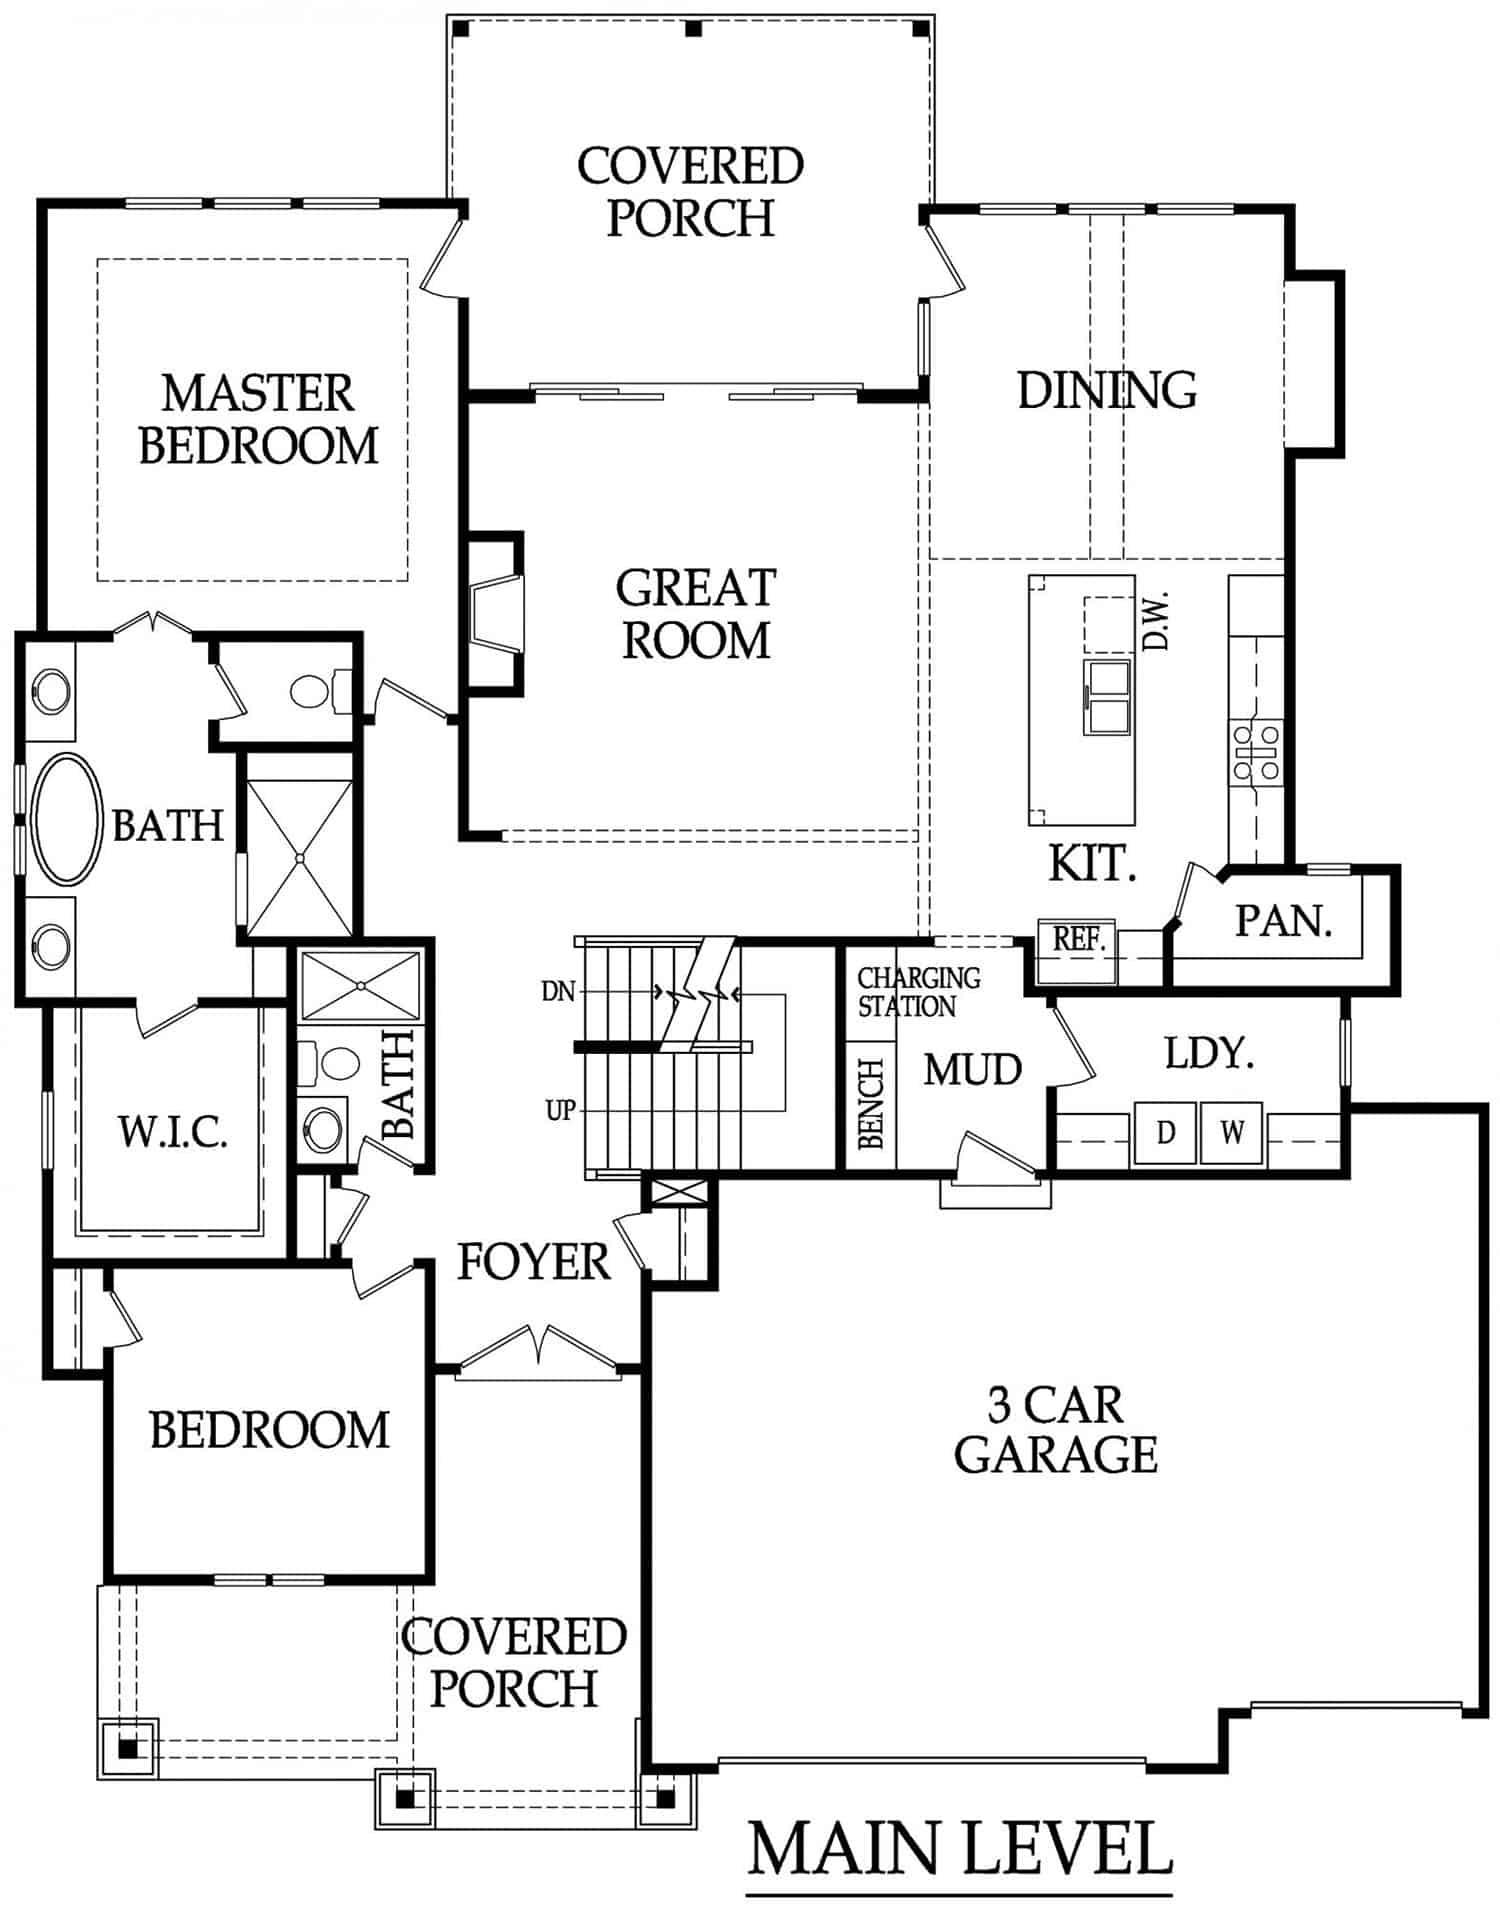 transitional-model-home-tour-floor-plan